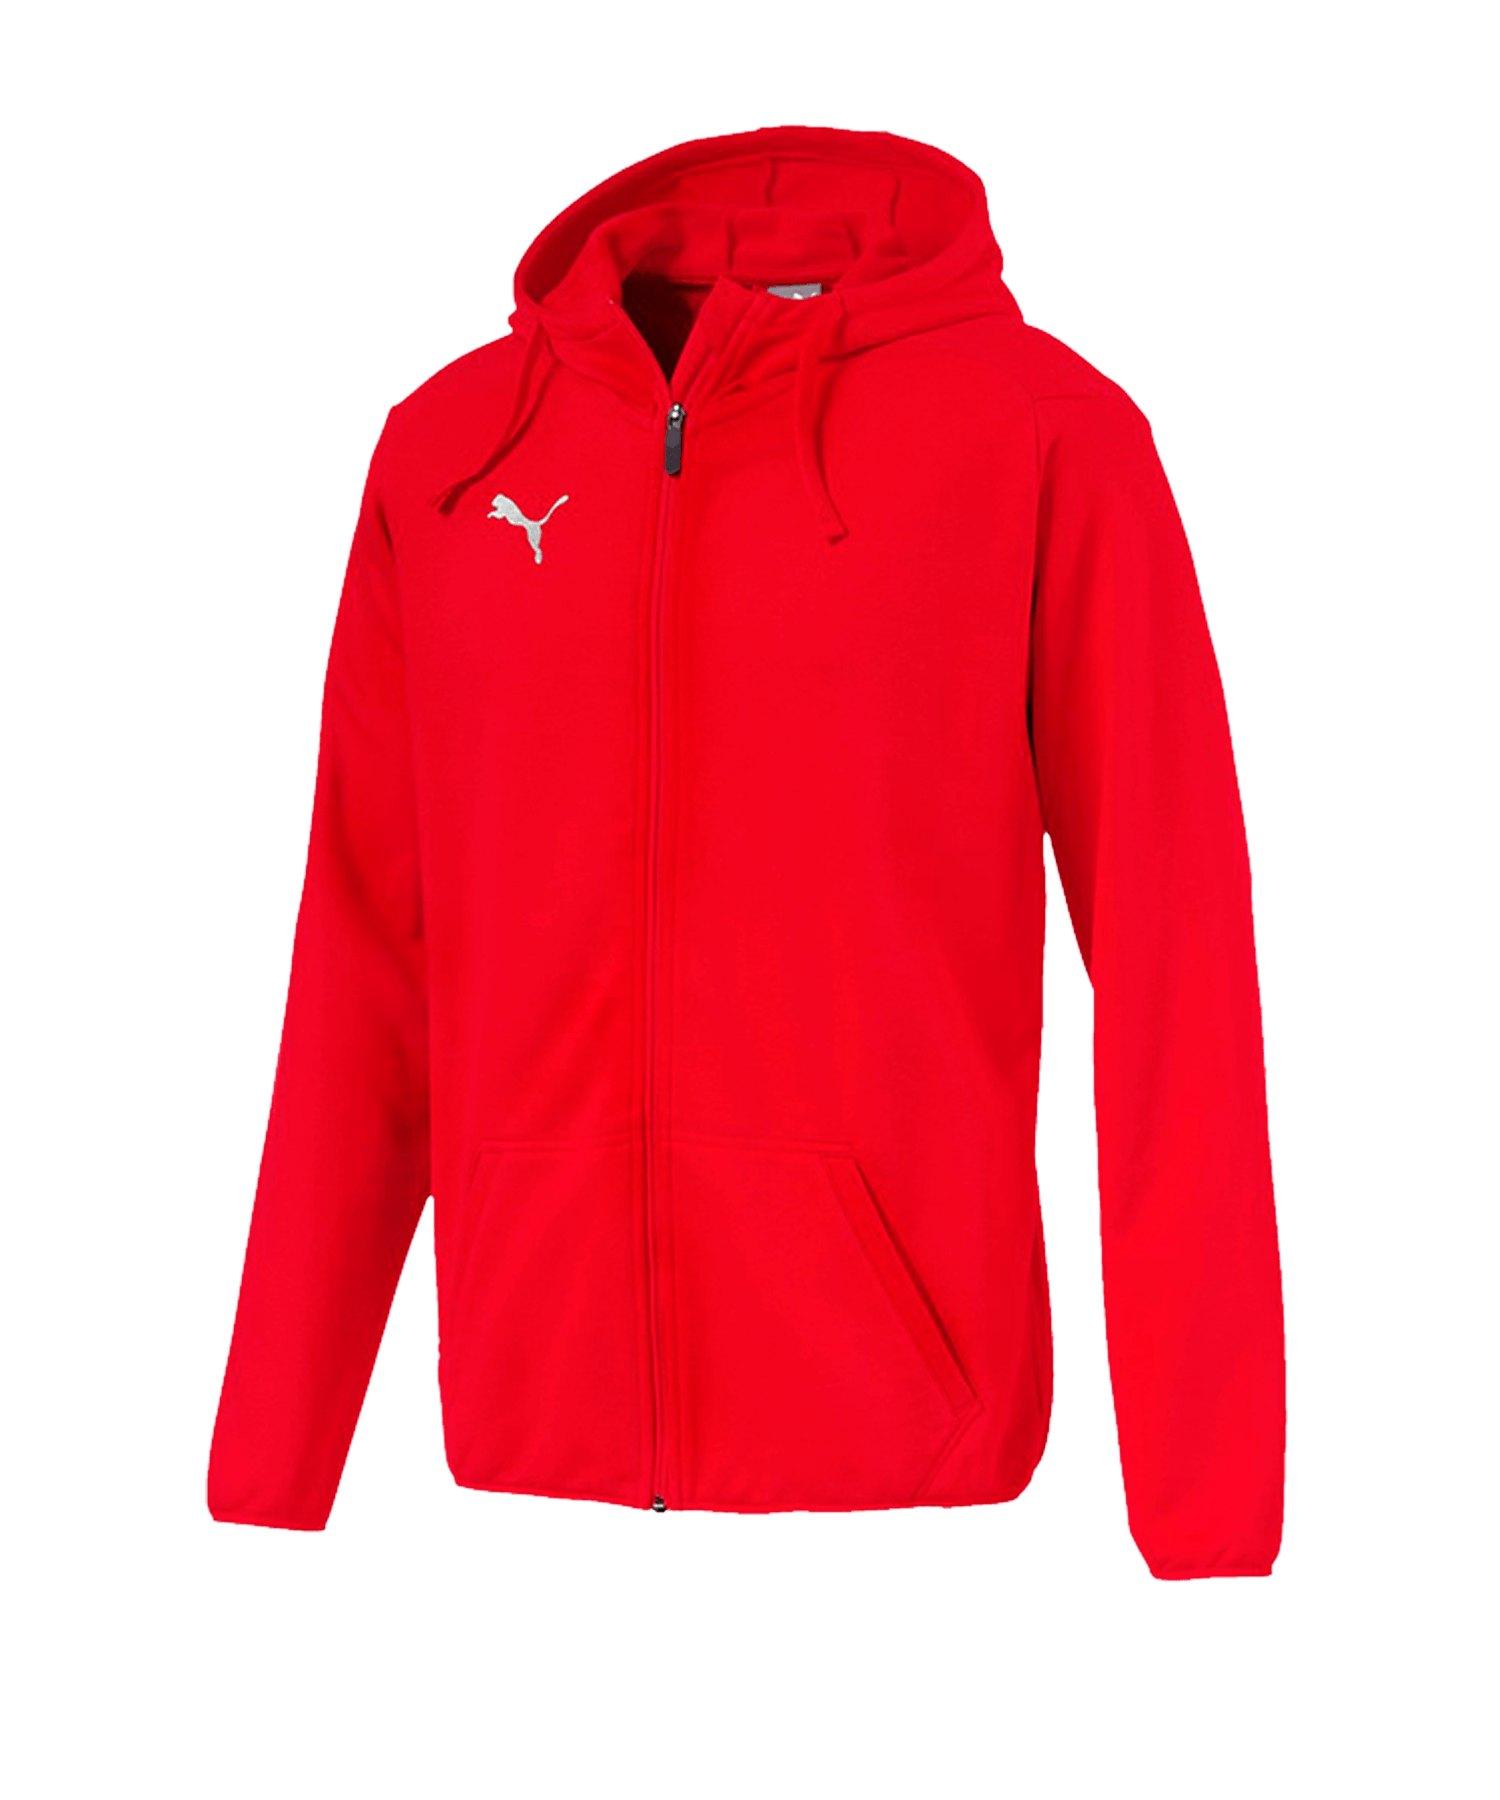 Casual Rot Trainingsjacke Liga Jacket F01 Teamsport Jacke Puma 5wAUpqx7q